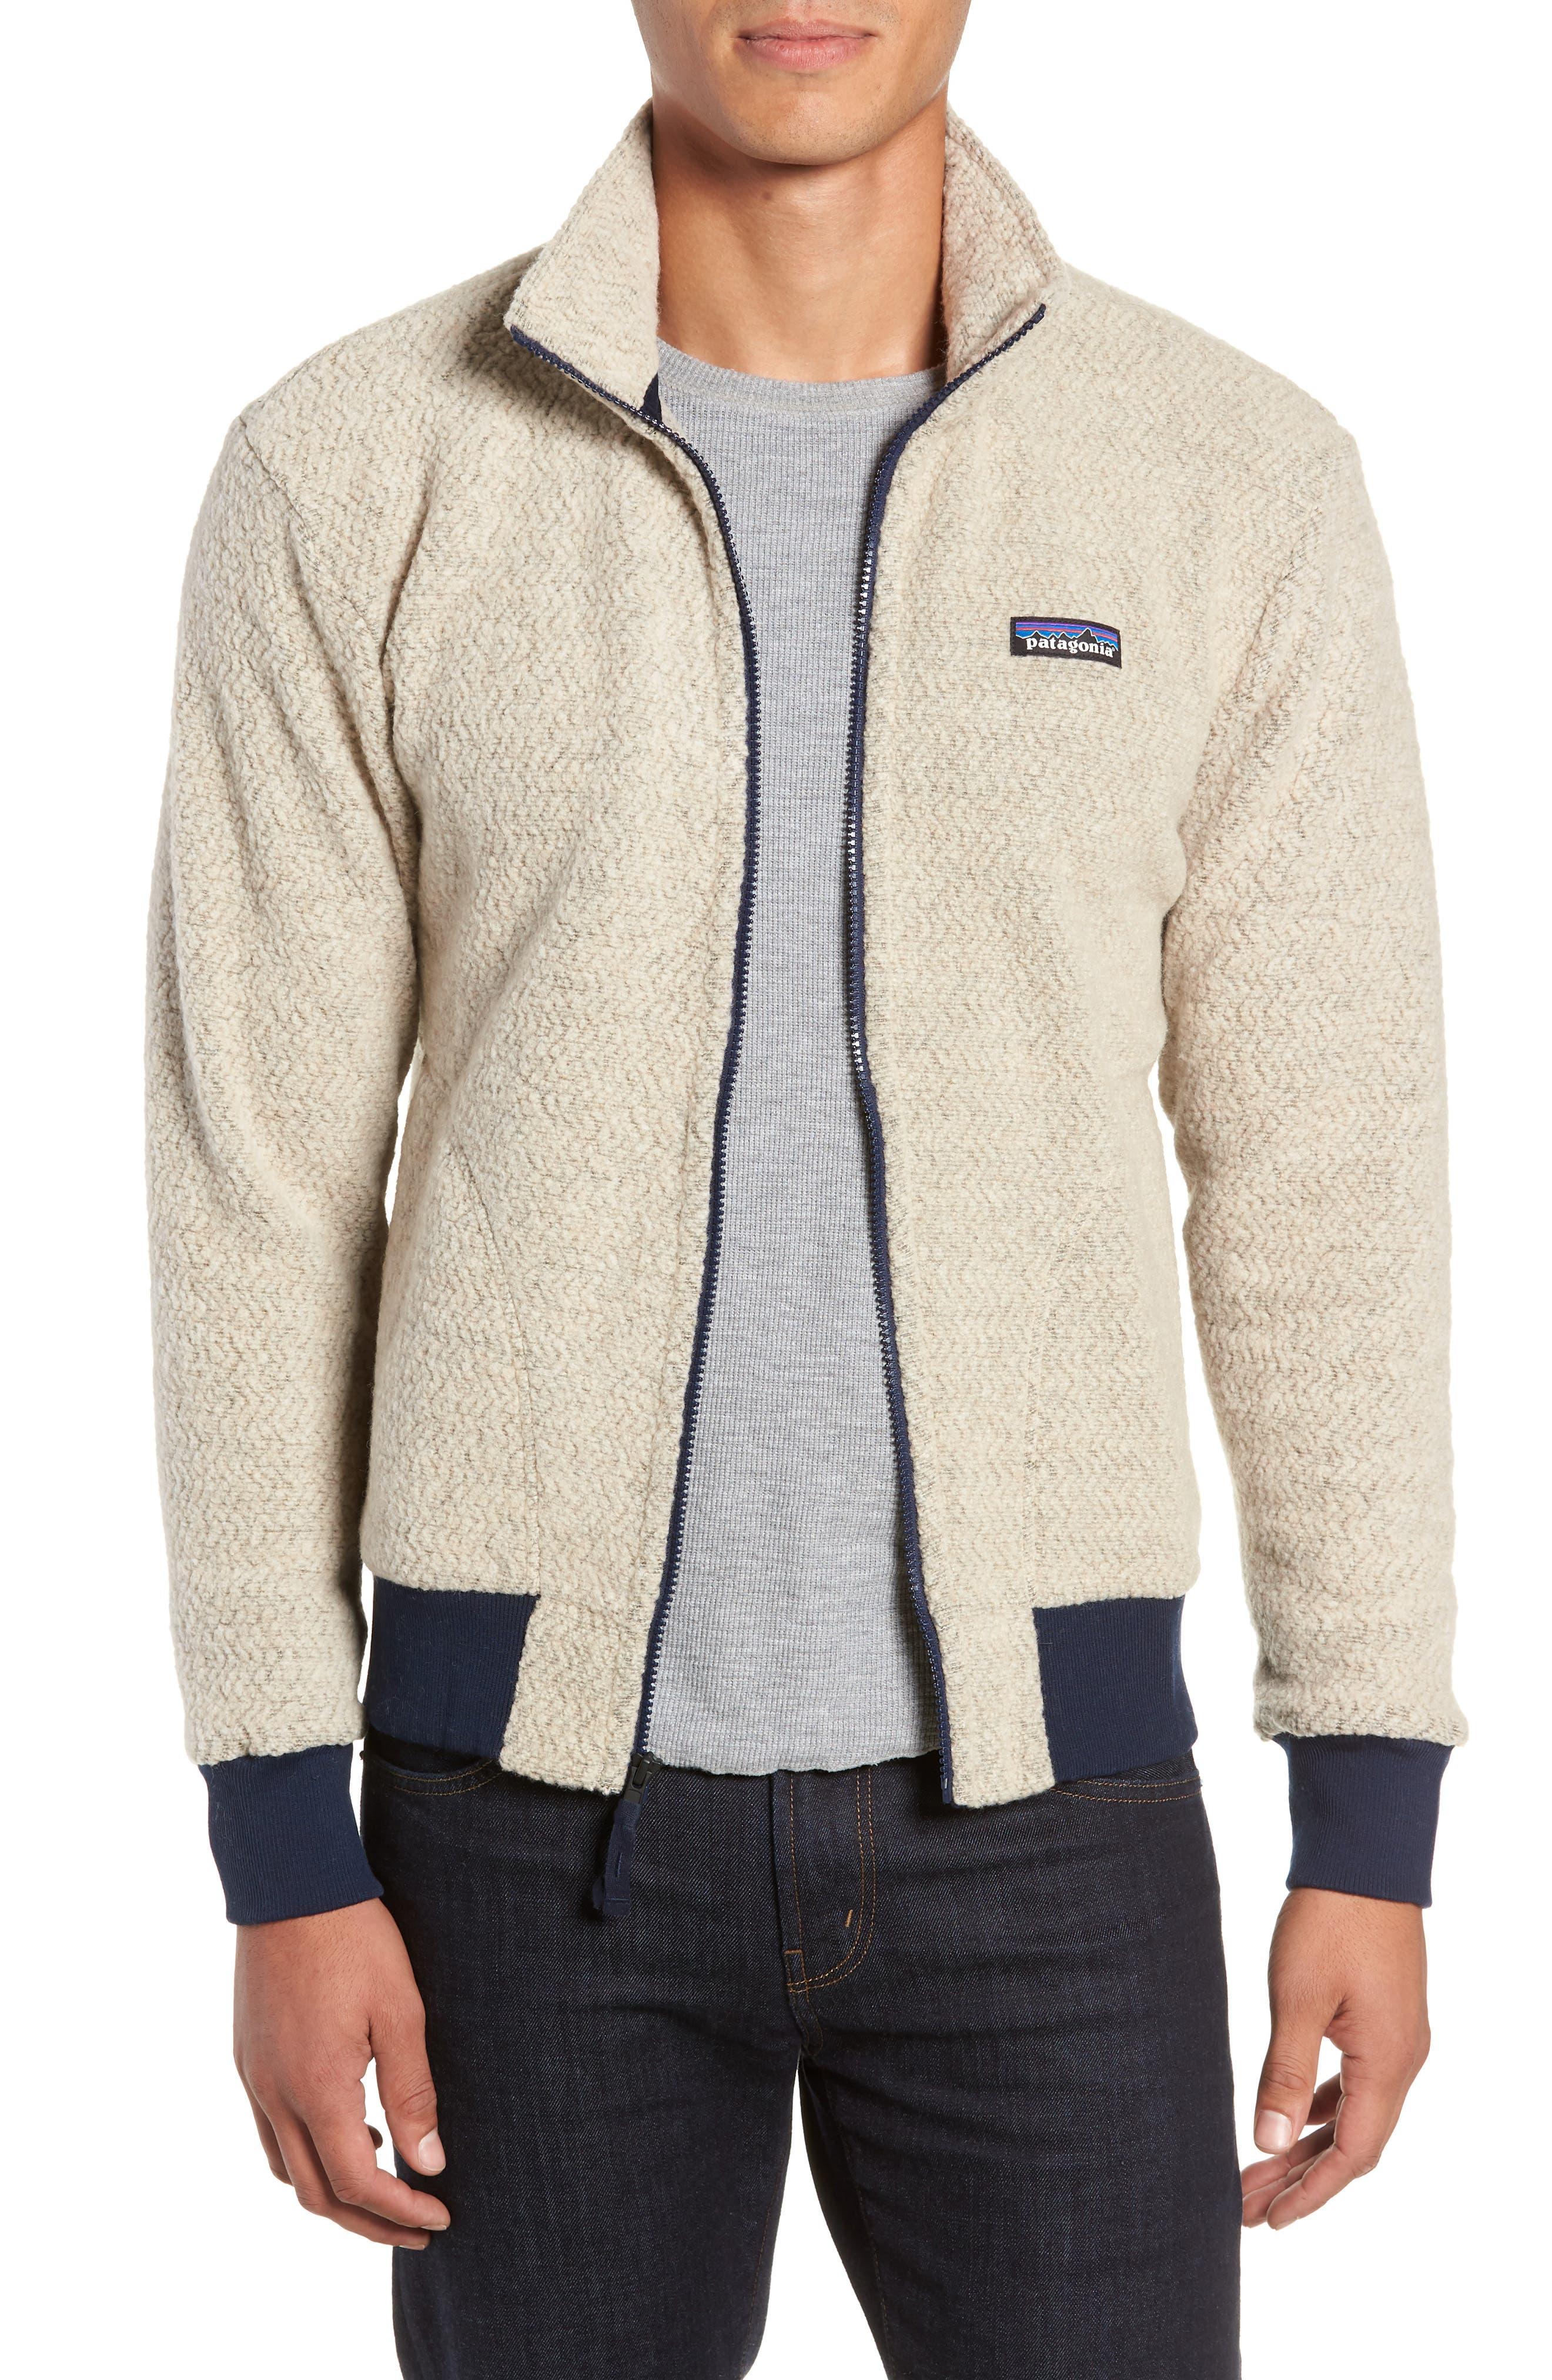 Woolyester Fleece Jacket,                             Main thumbnail 1, color,                             OATMEAL HEATHER